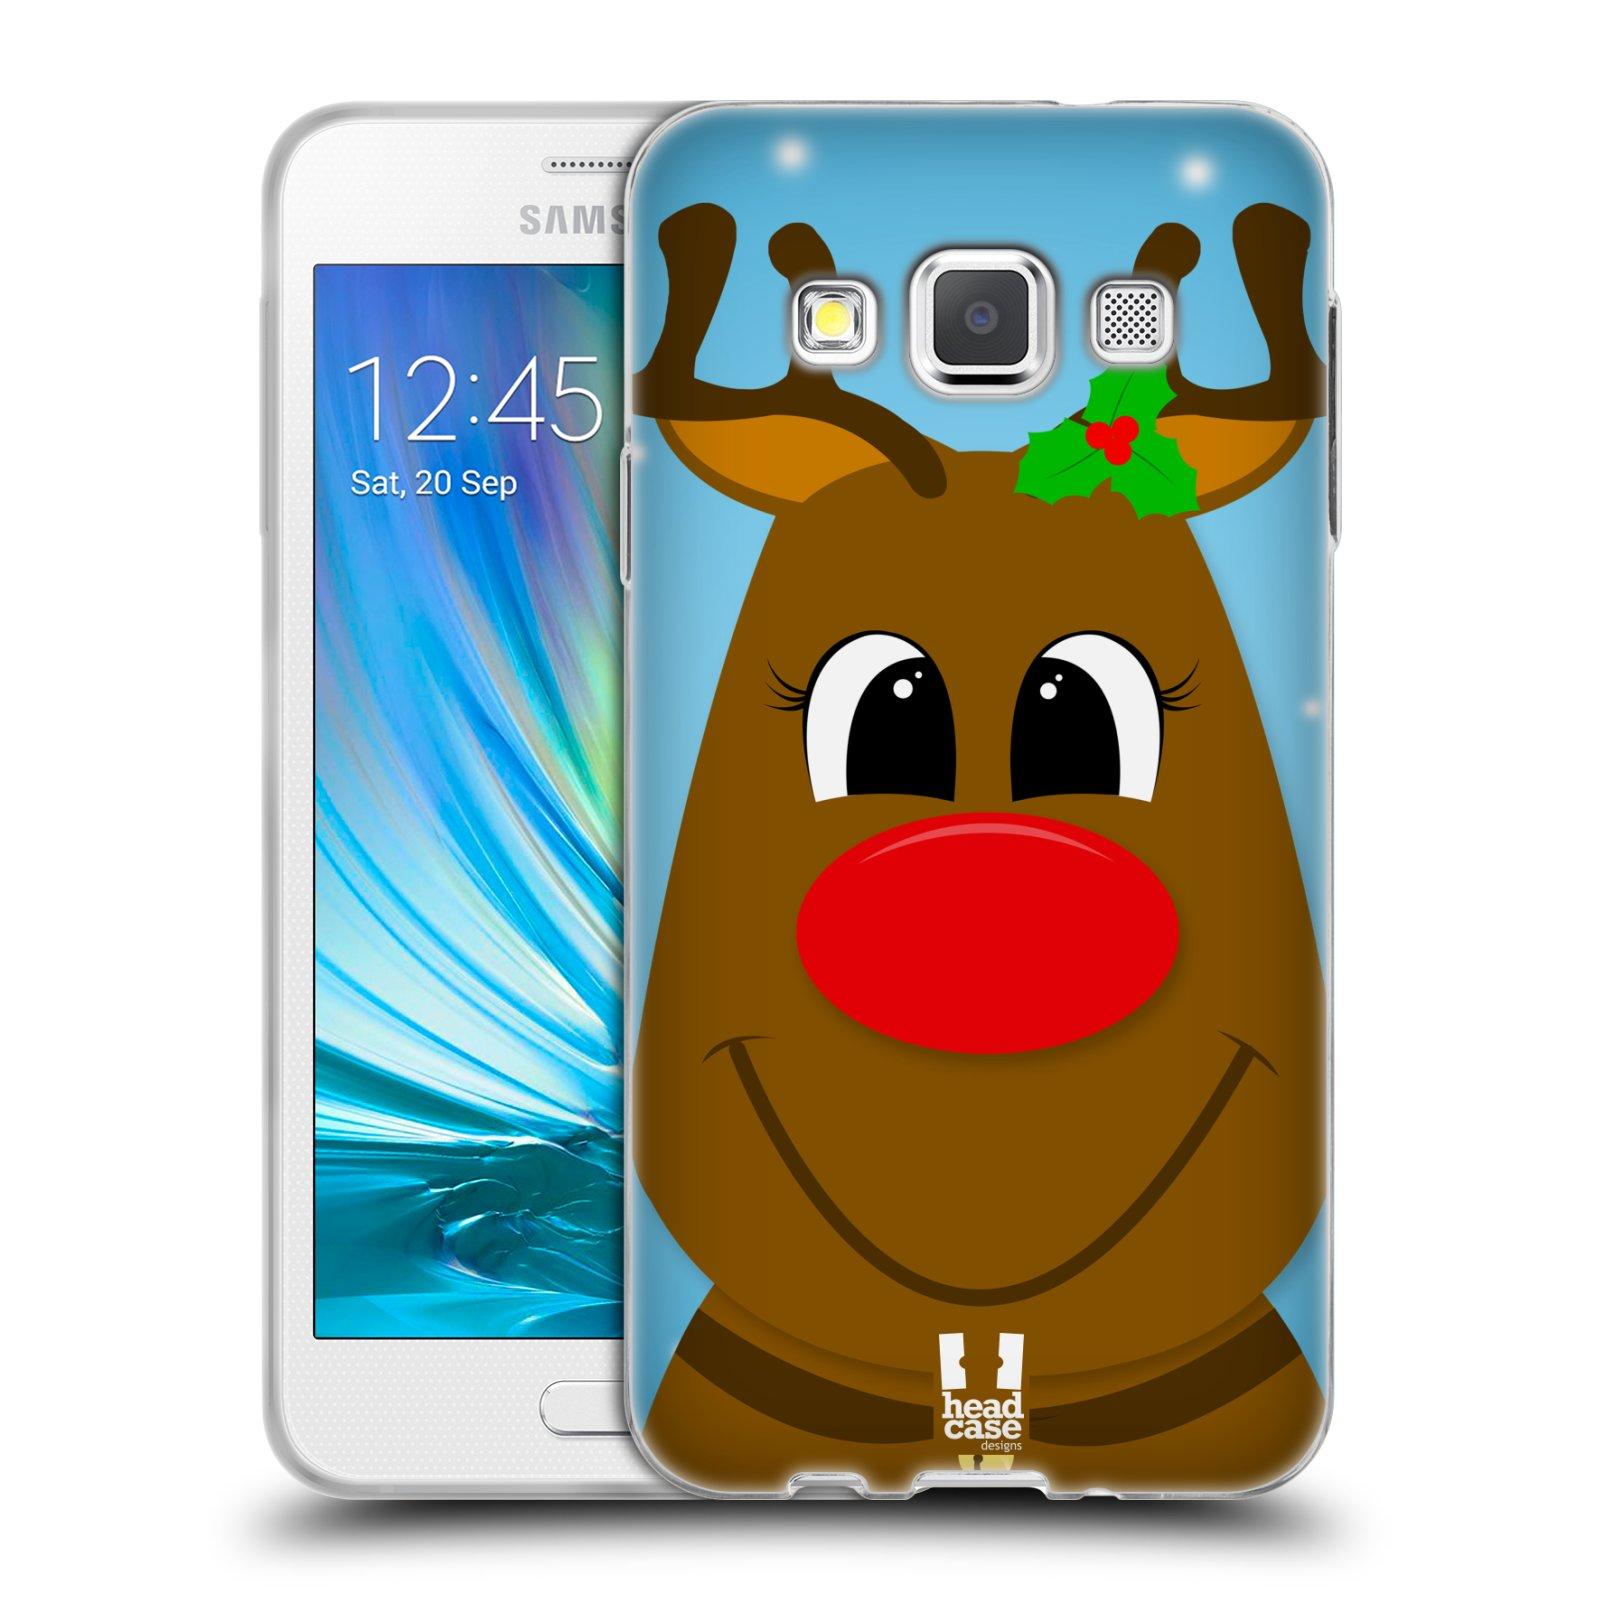 HEAD CASE silikonový obal na mobil Samsung Galaxy A3 vzor Vánoční tváře kreslené SOB RUDOLF